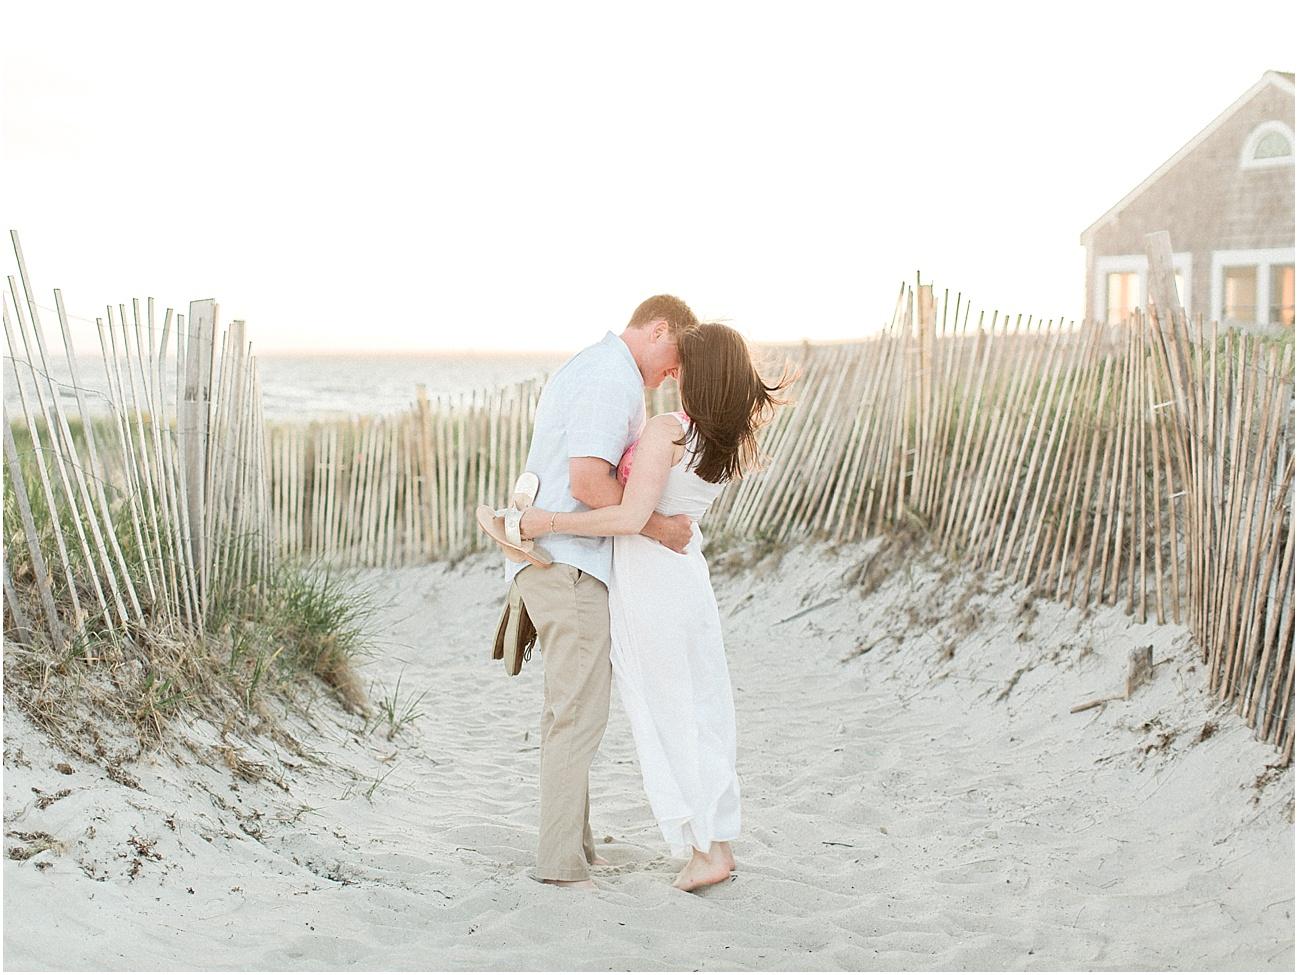 shannon_dan_engagement_session_sea_crest_beach_old_silver_chartroom_yacht_club_cape_cod_boston_wedding_photographer_meredith_jane_photography_photo_0338.jpg